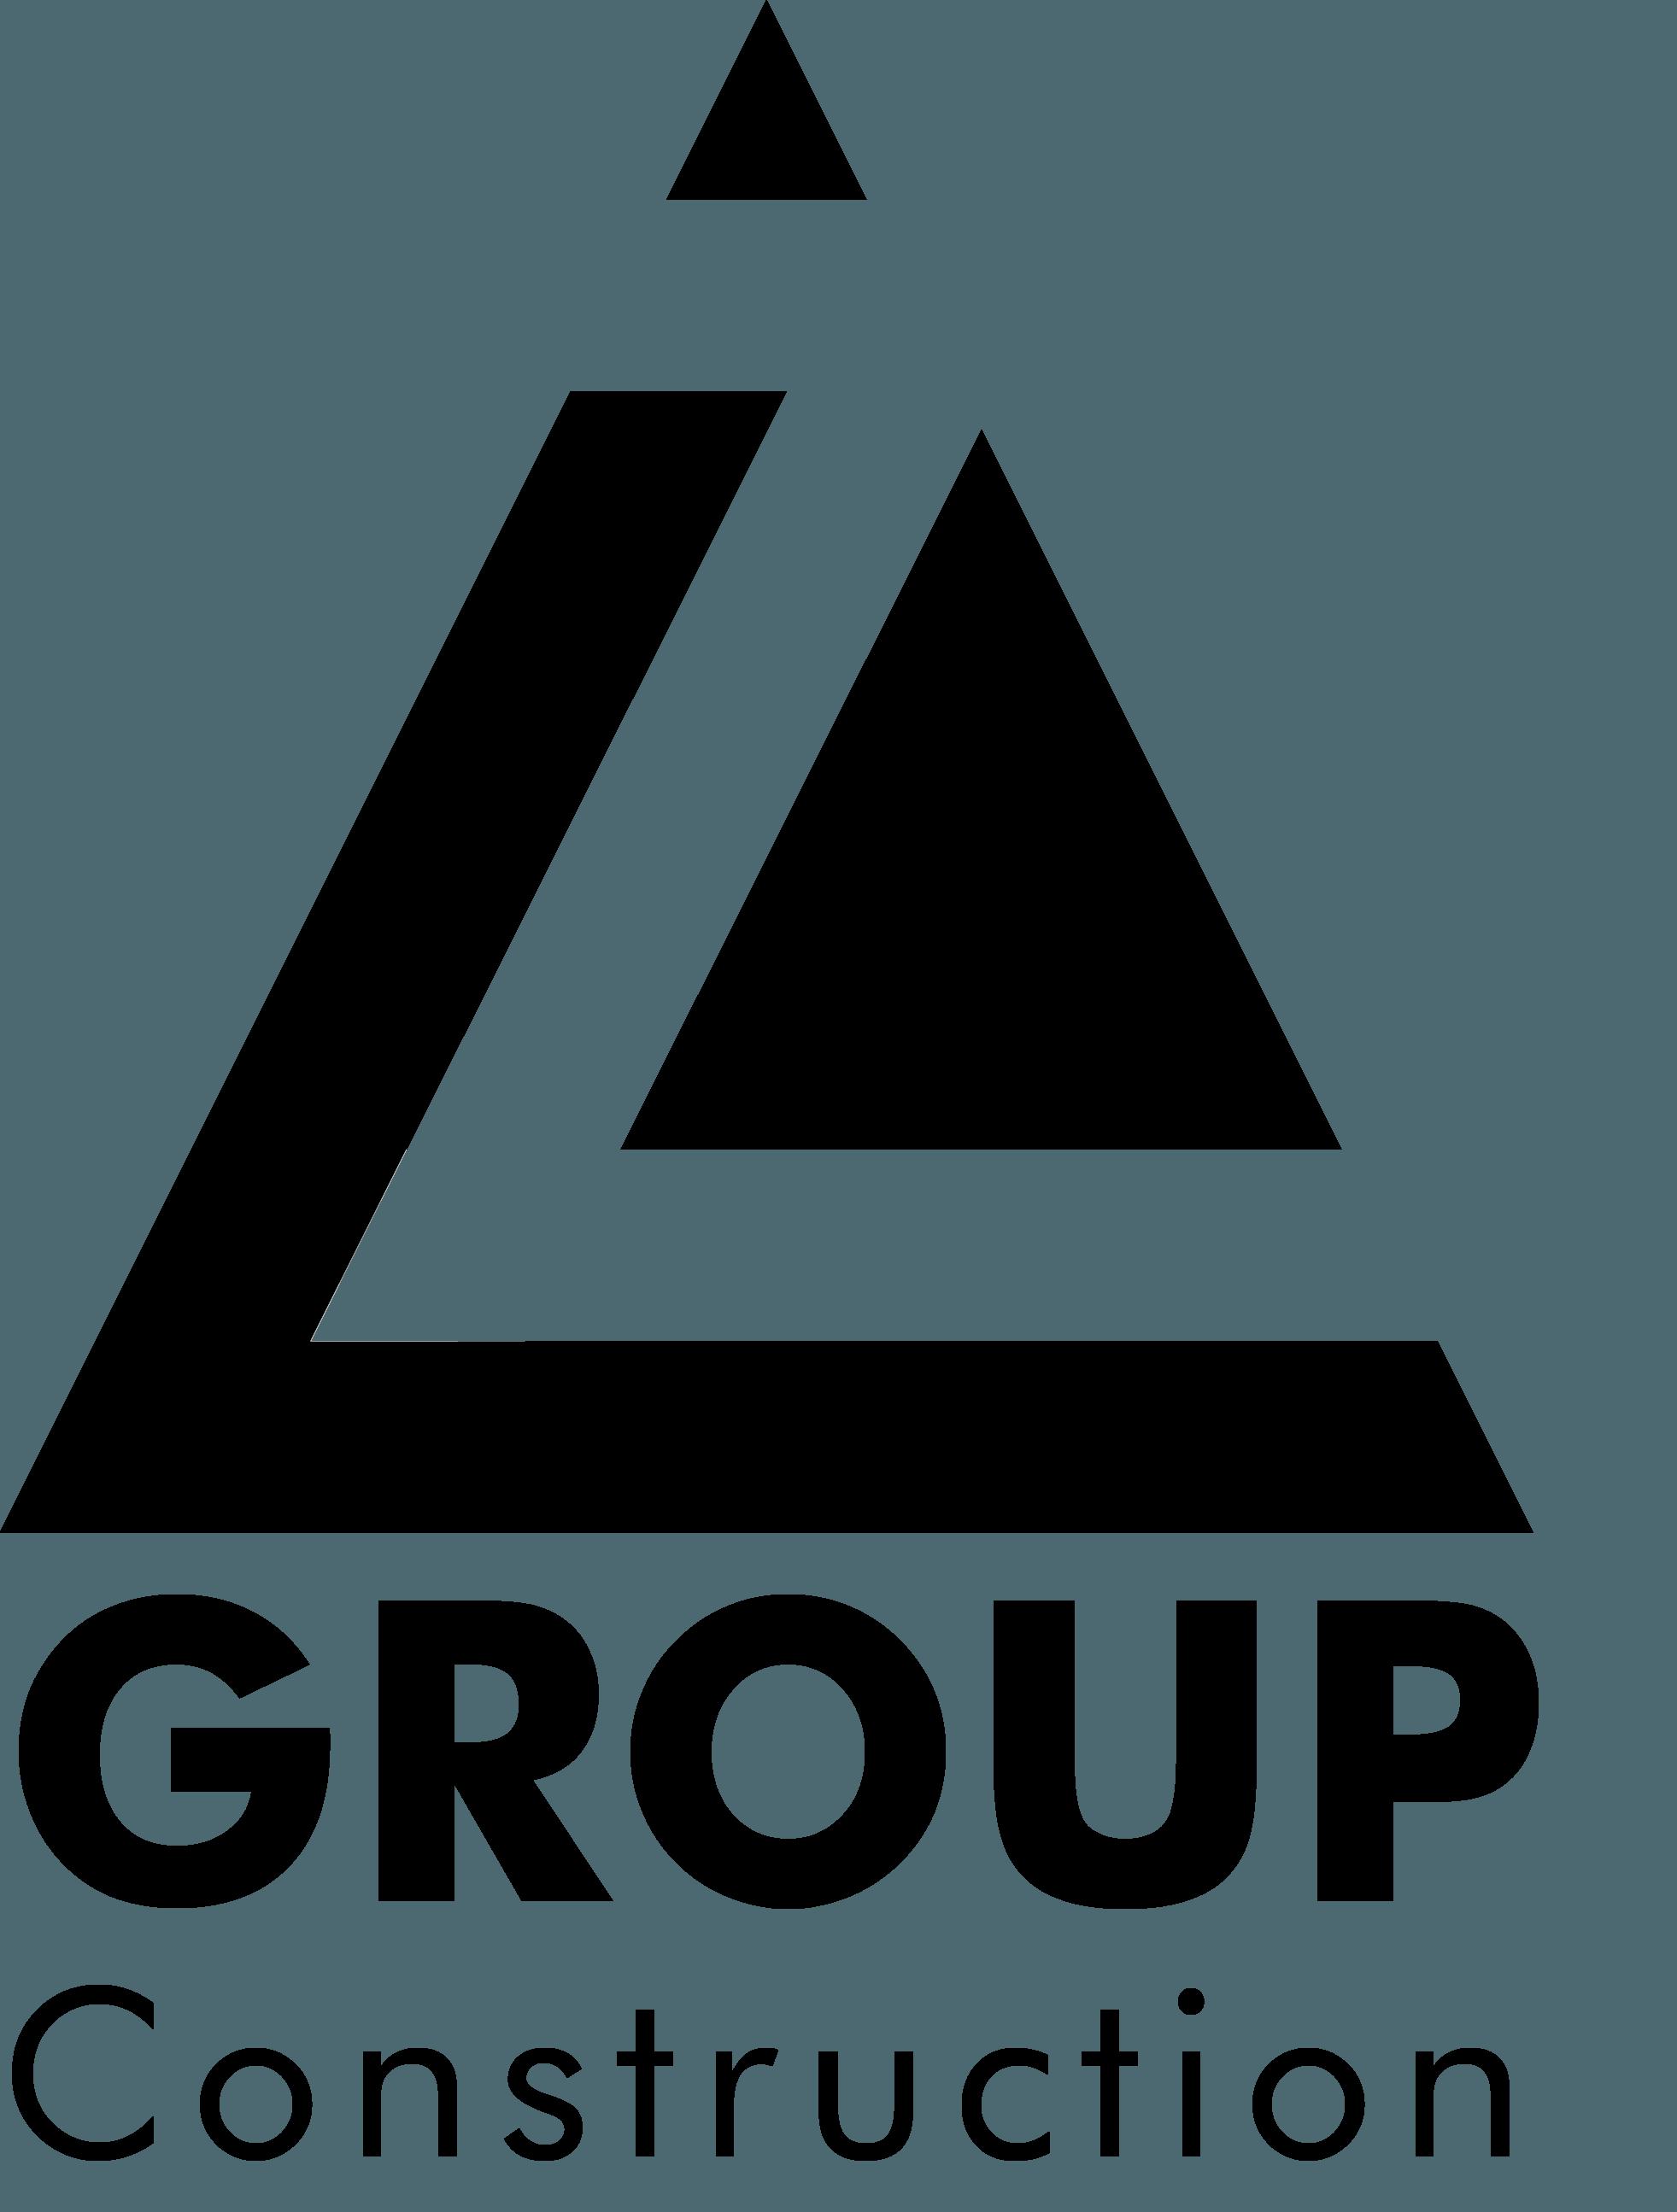 AZ Group Construction